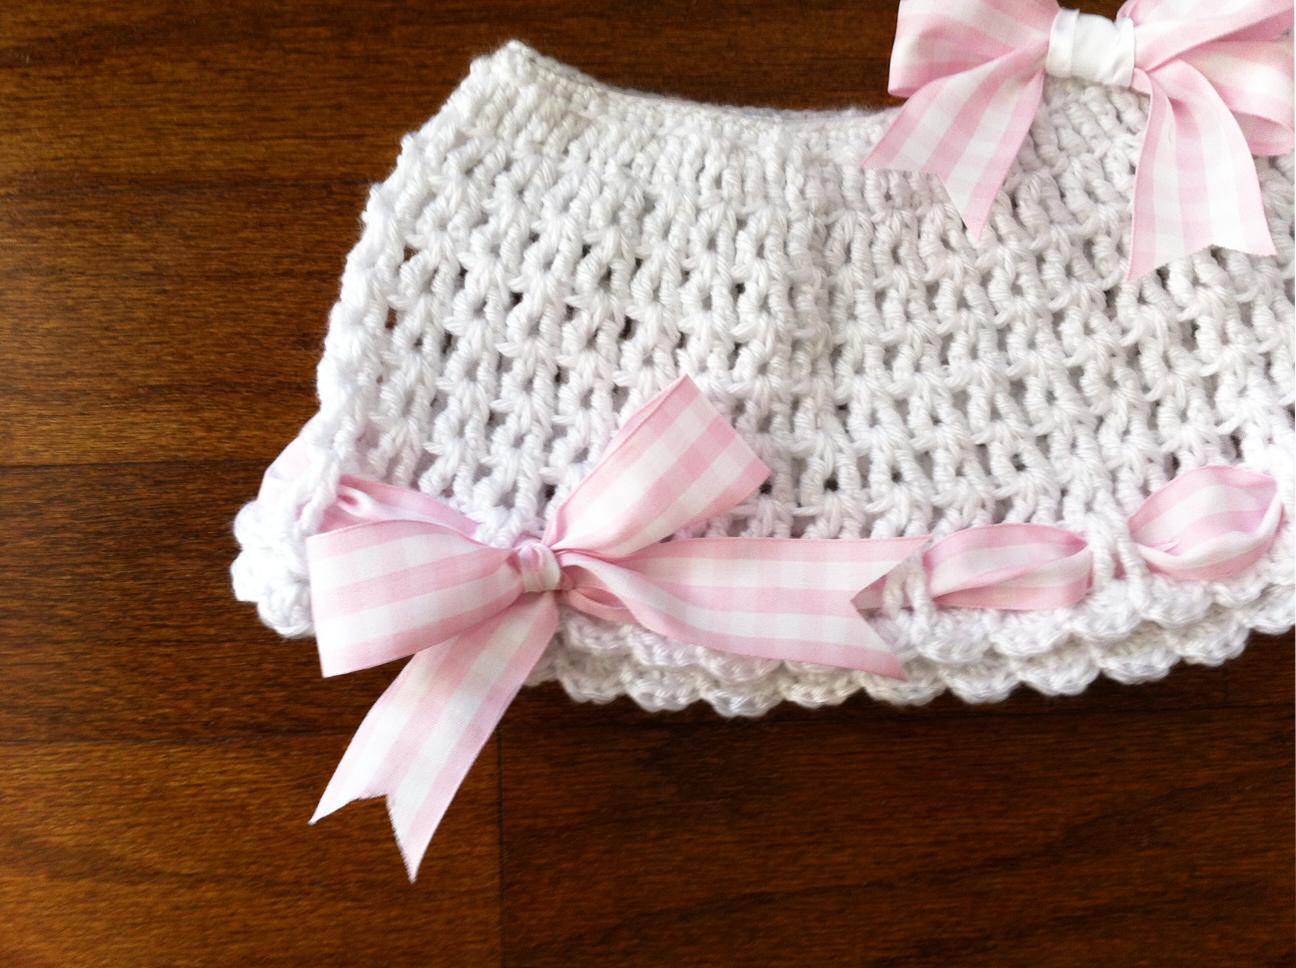 Newborn Ruffle Skirt Crocheted Set 0-12 Months, Baby Clothing ...